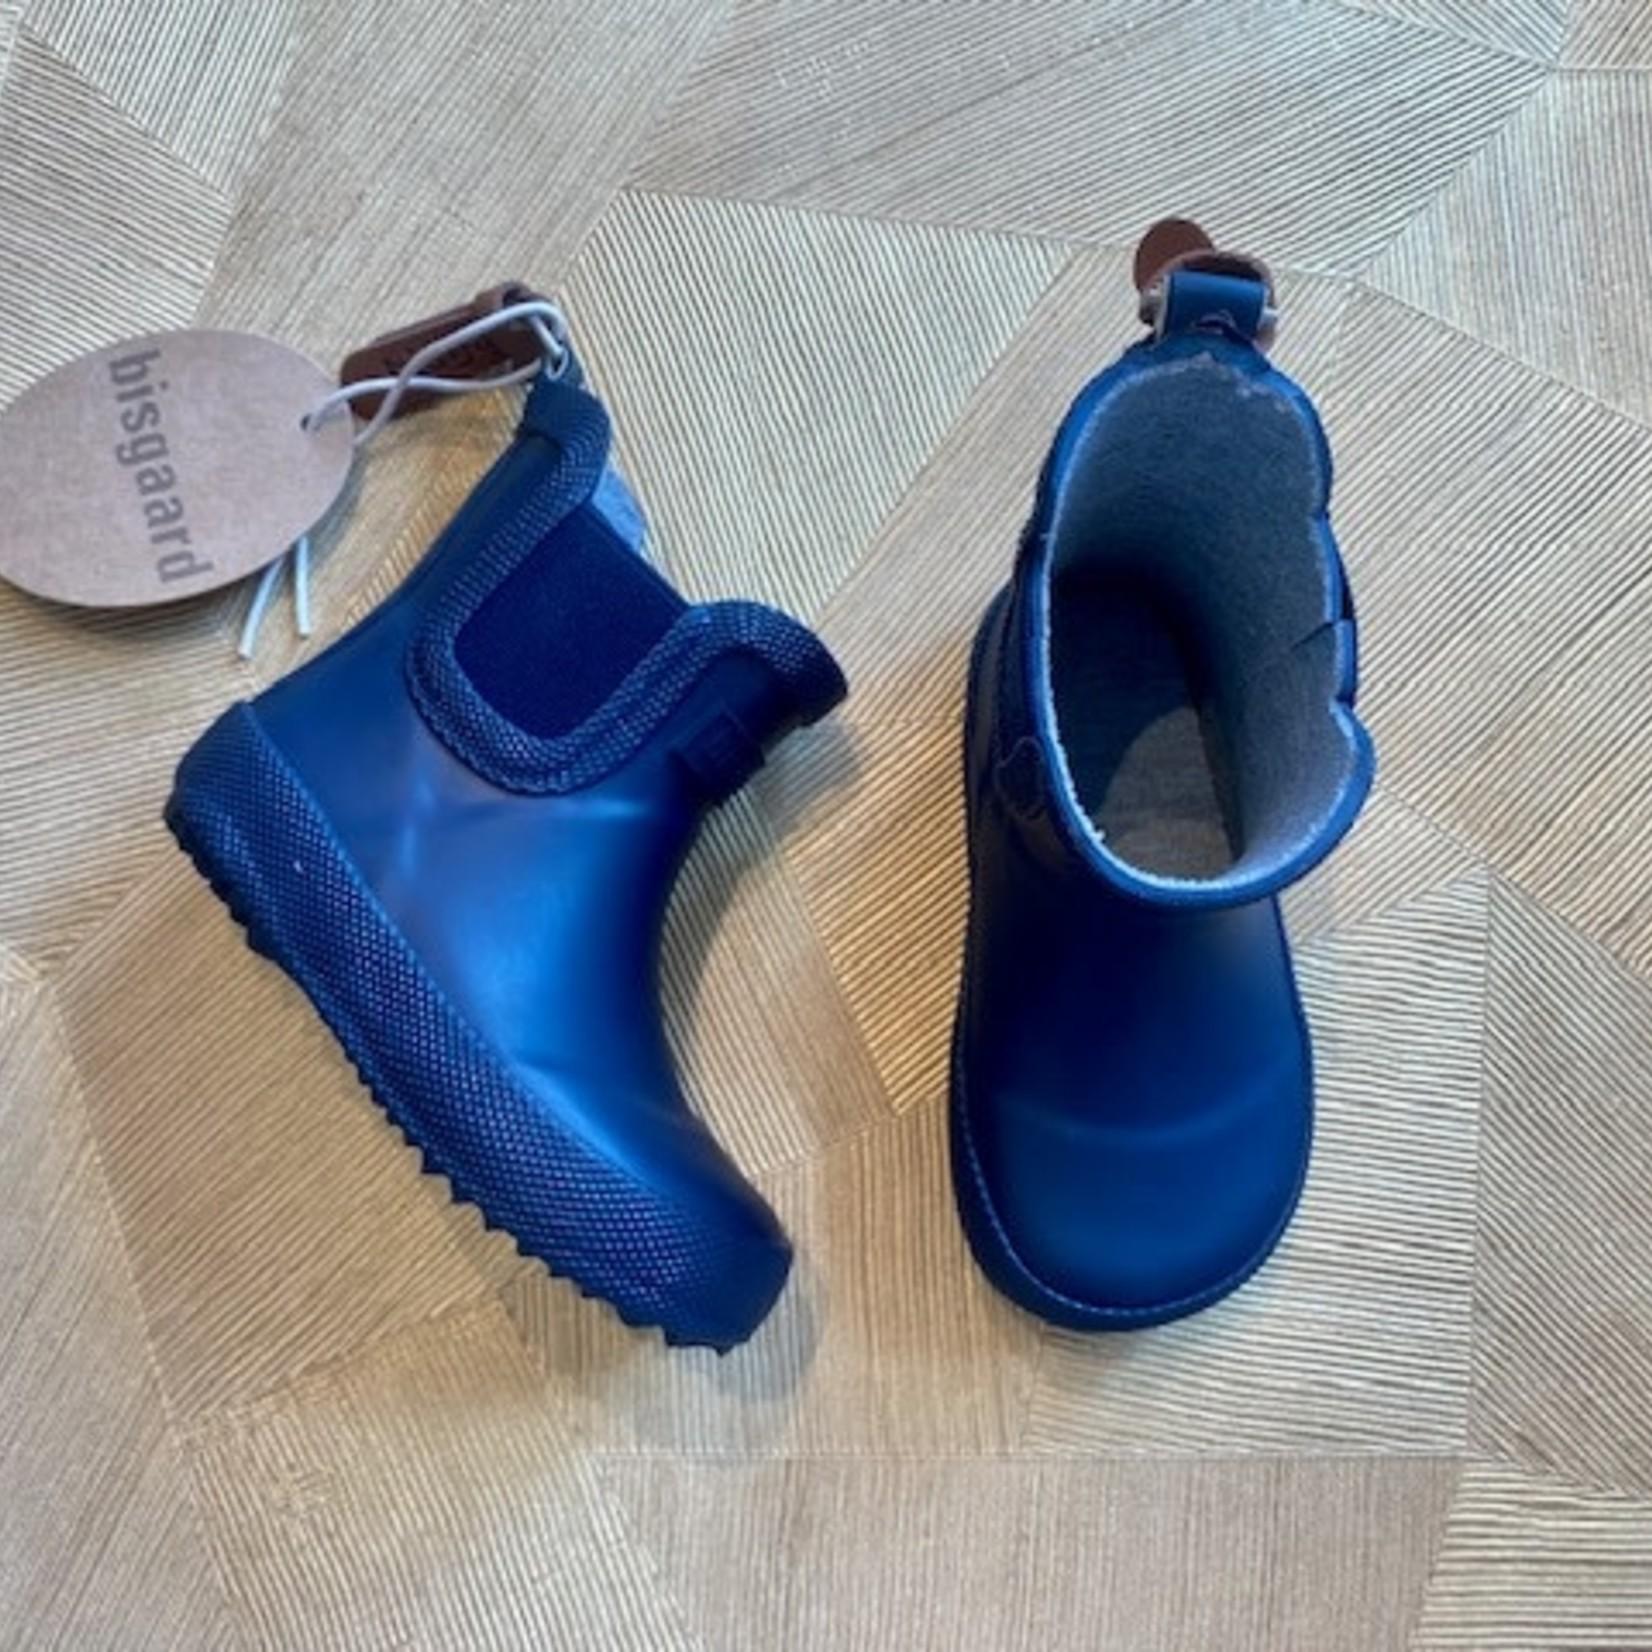 BISGAARD BISGAARD regenlaars blue